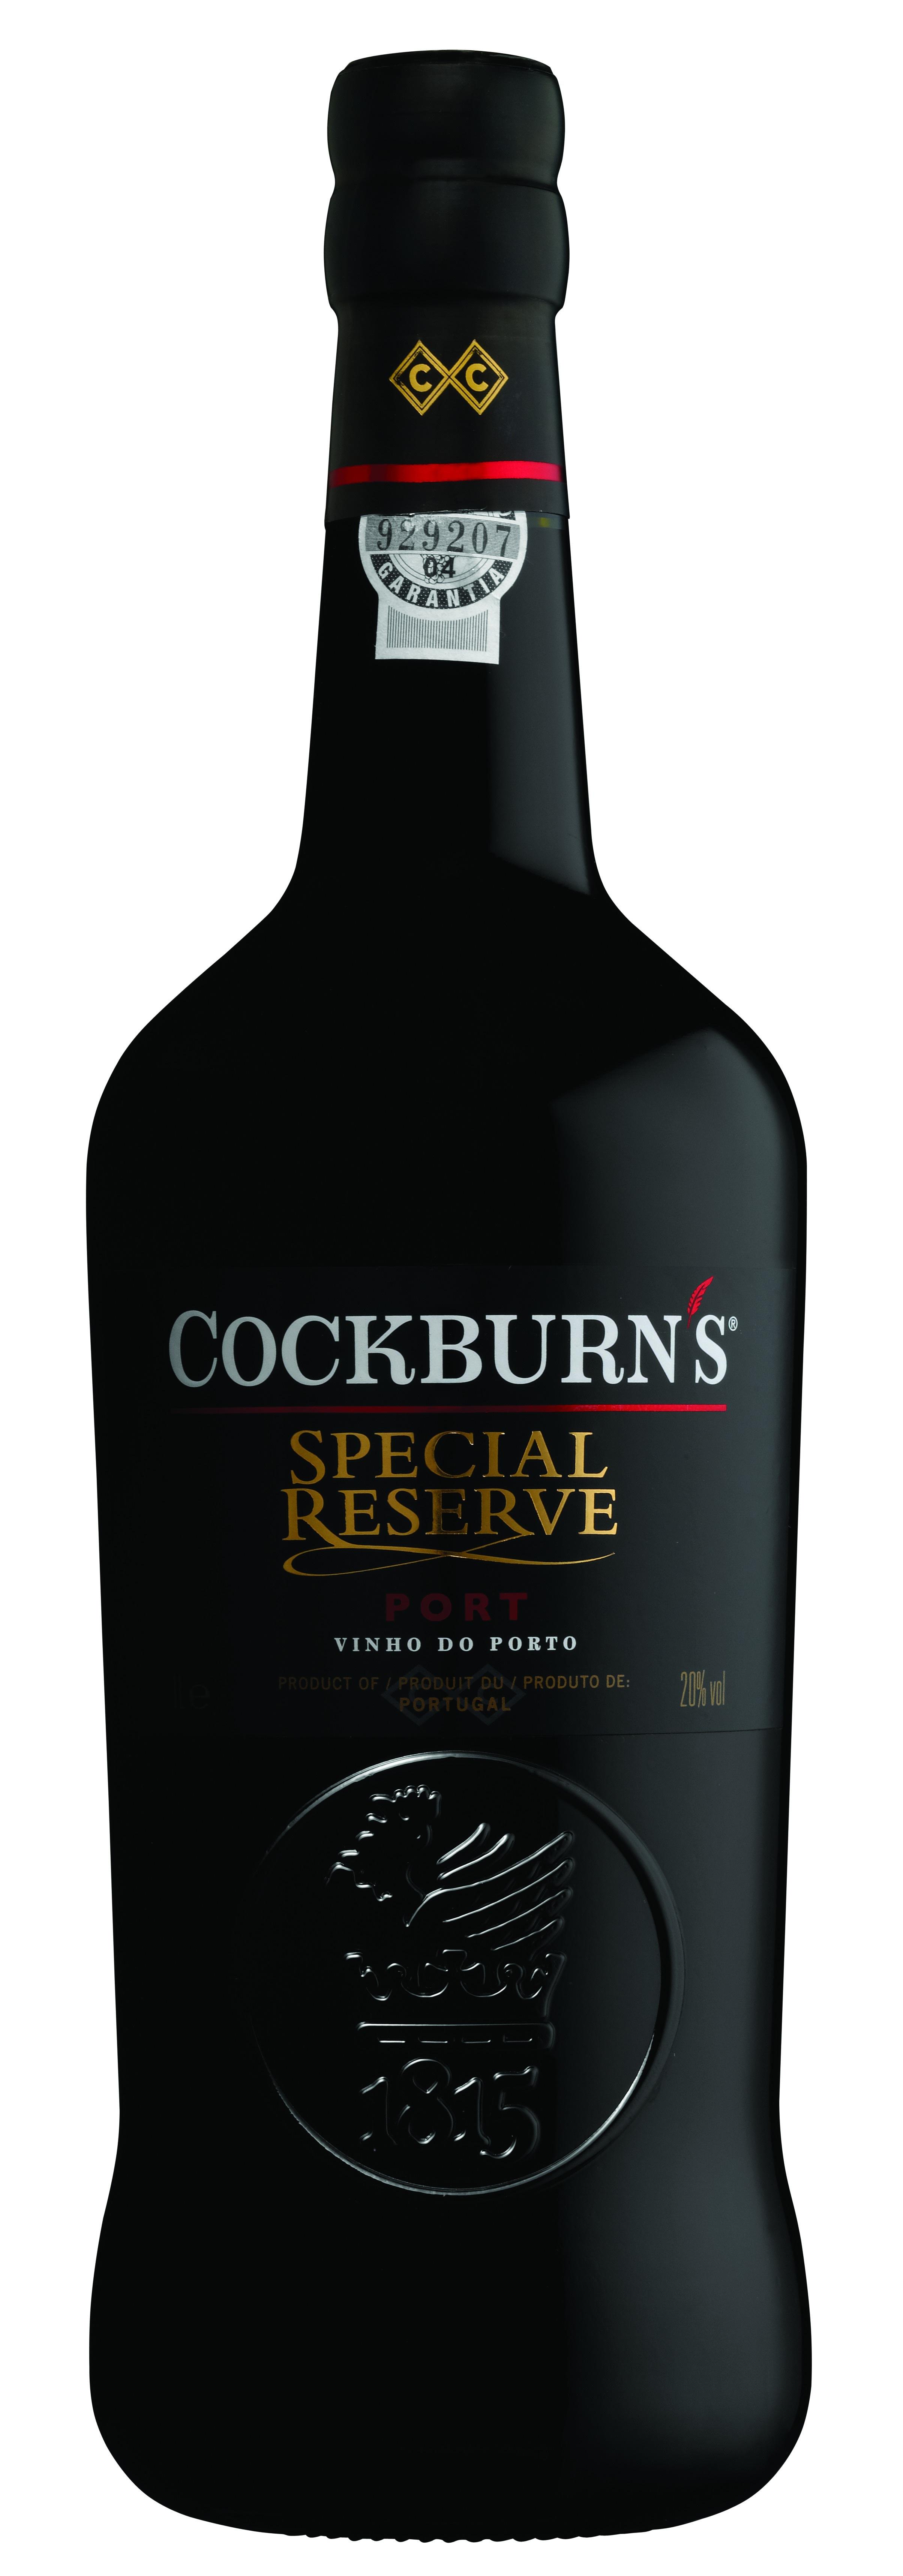 Cockburn´s Special Reserve